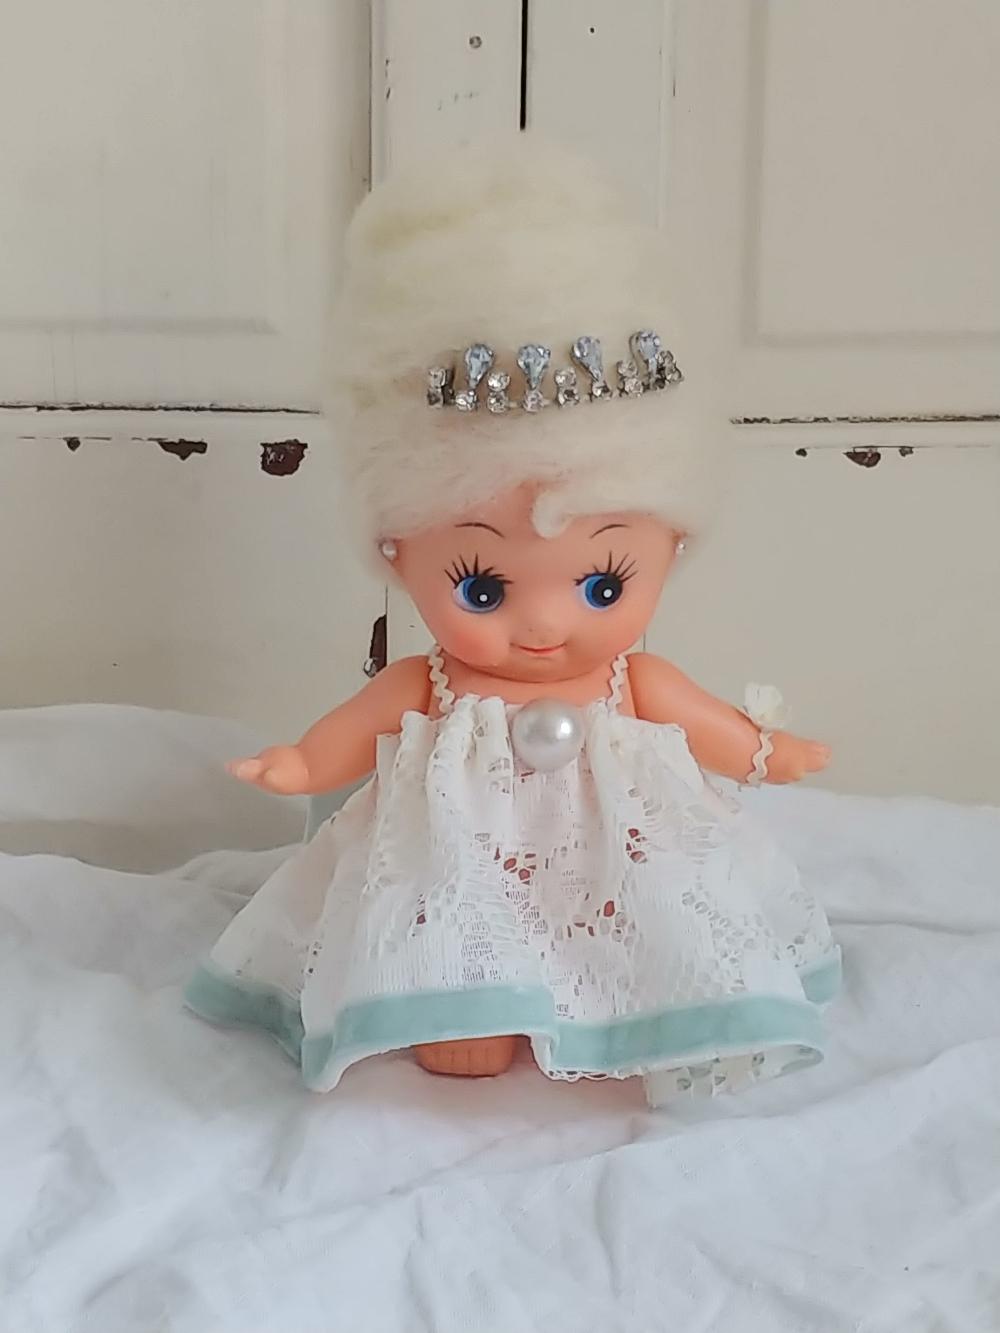 Kewpie doll makeover